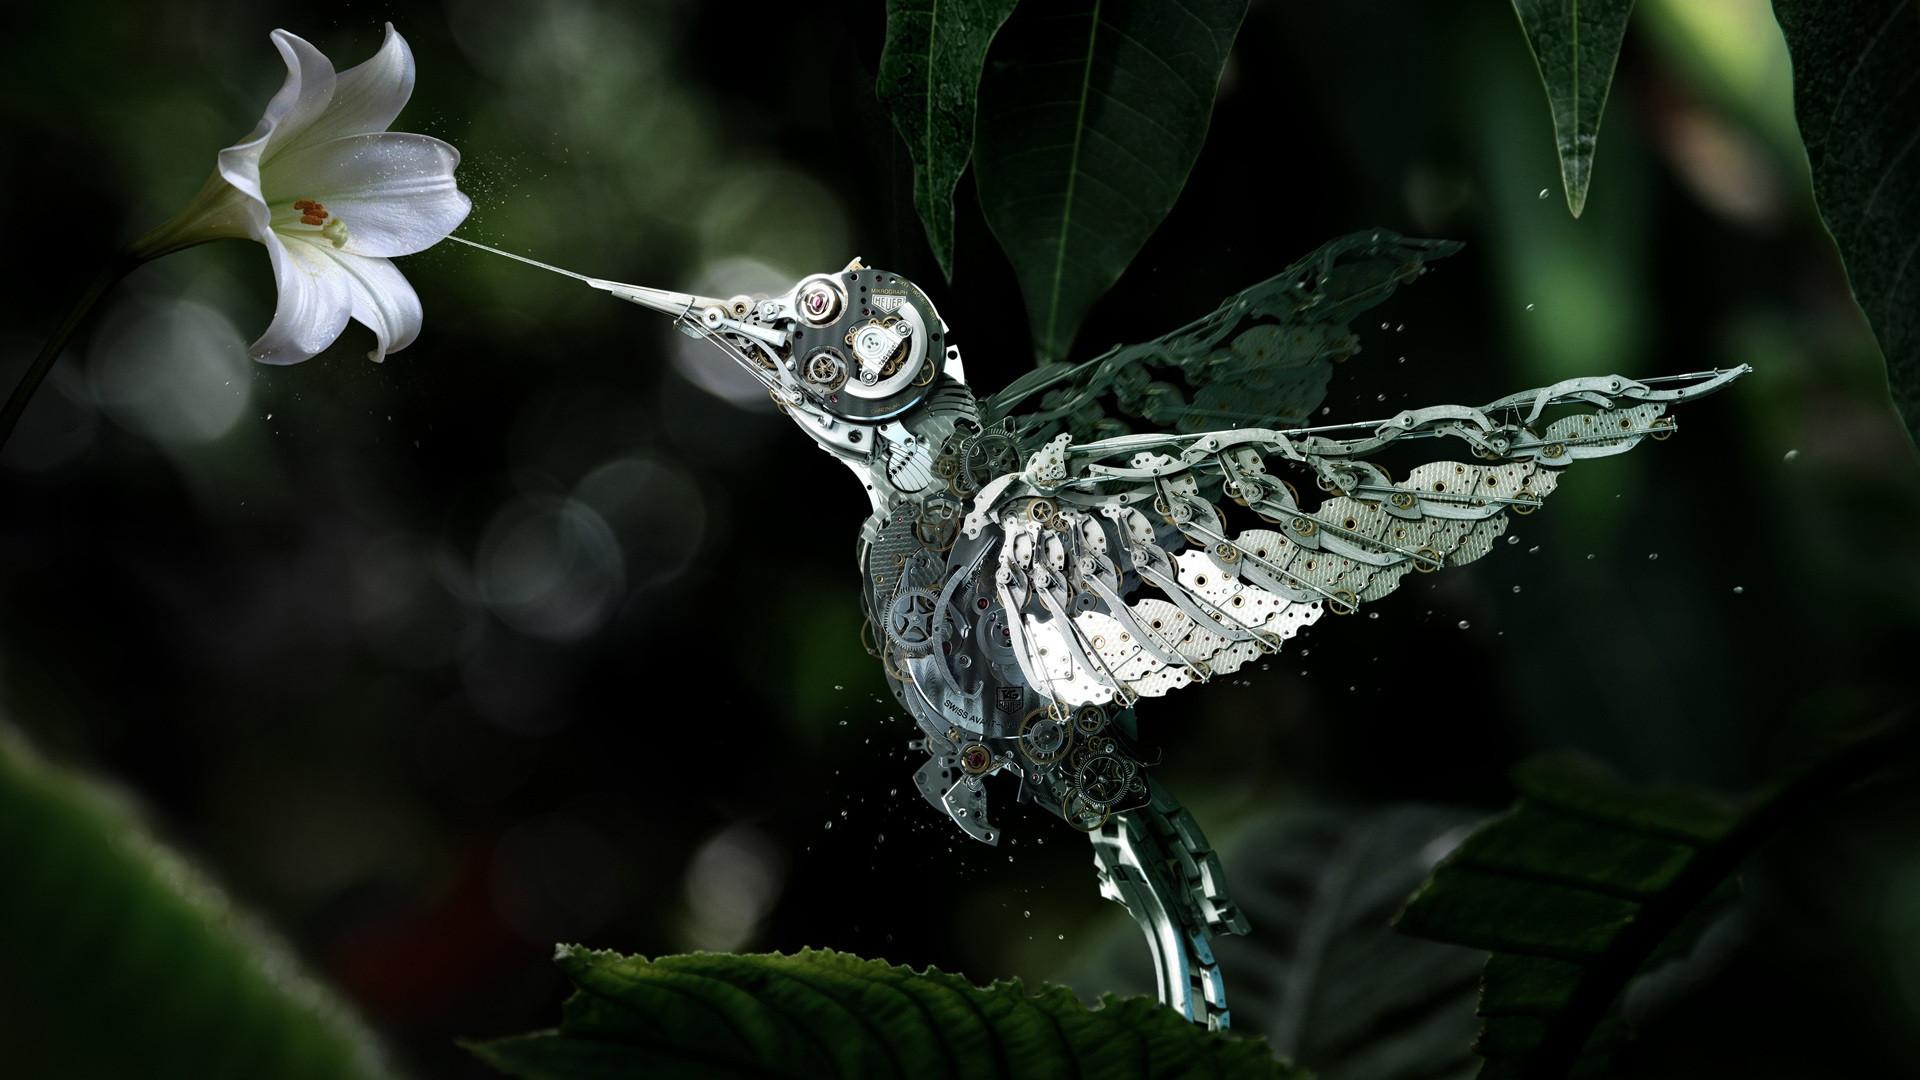 A-beautiful-mechanical-hummingbird-x-wallpaper-wp5203652